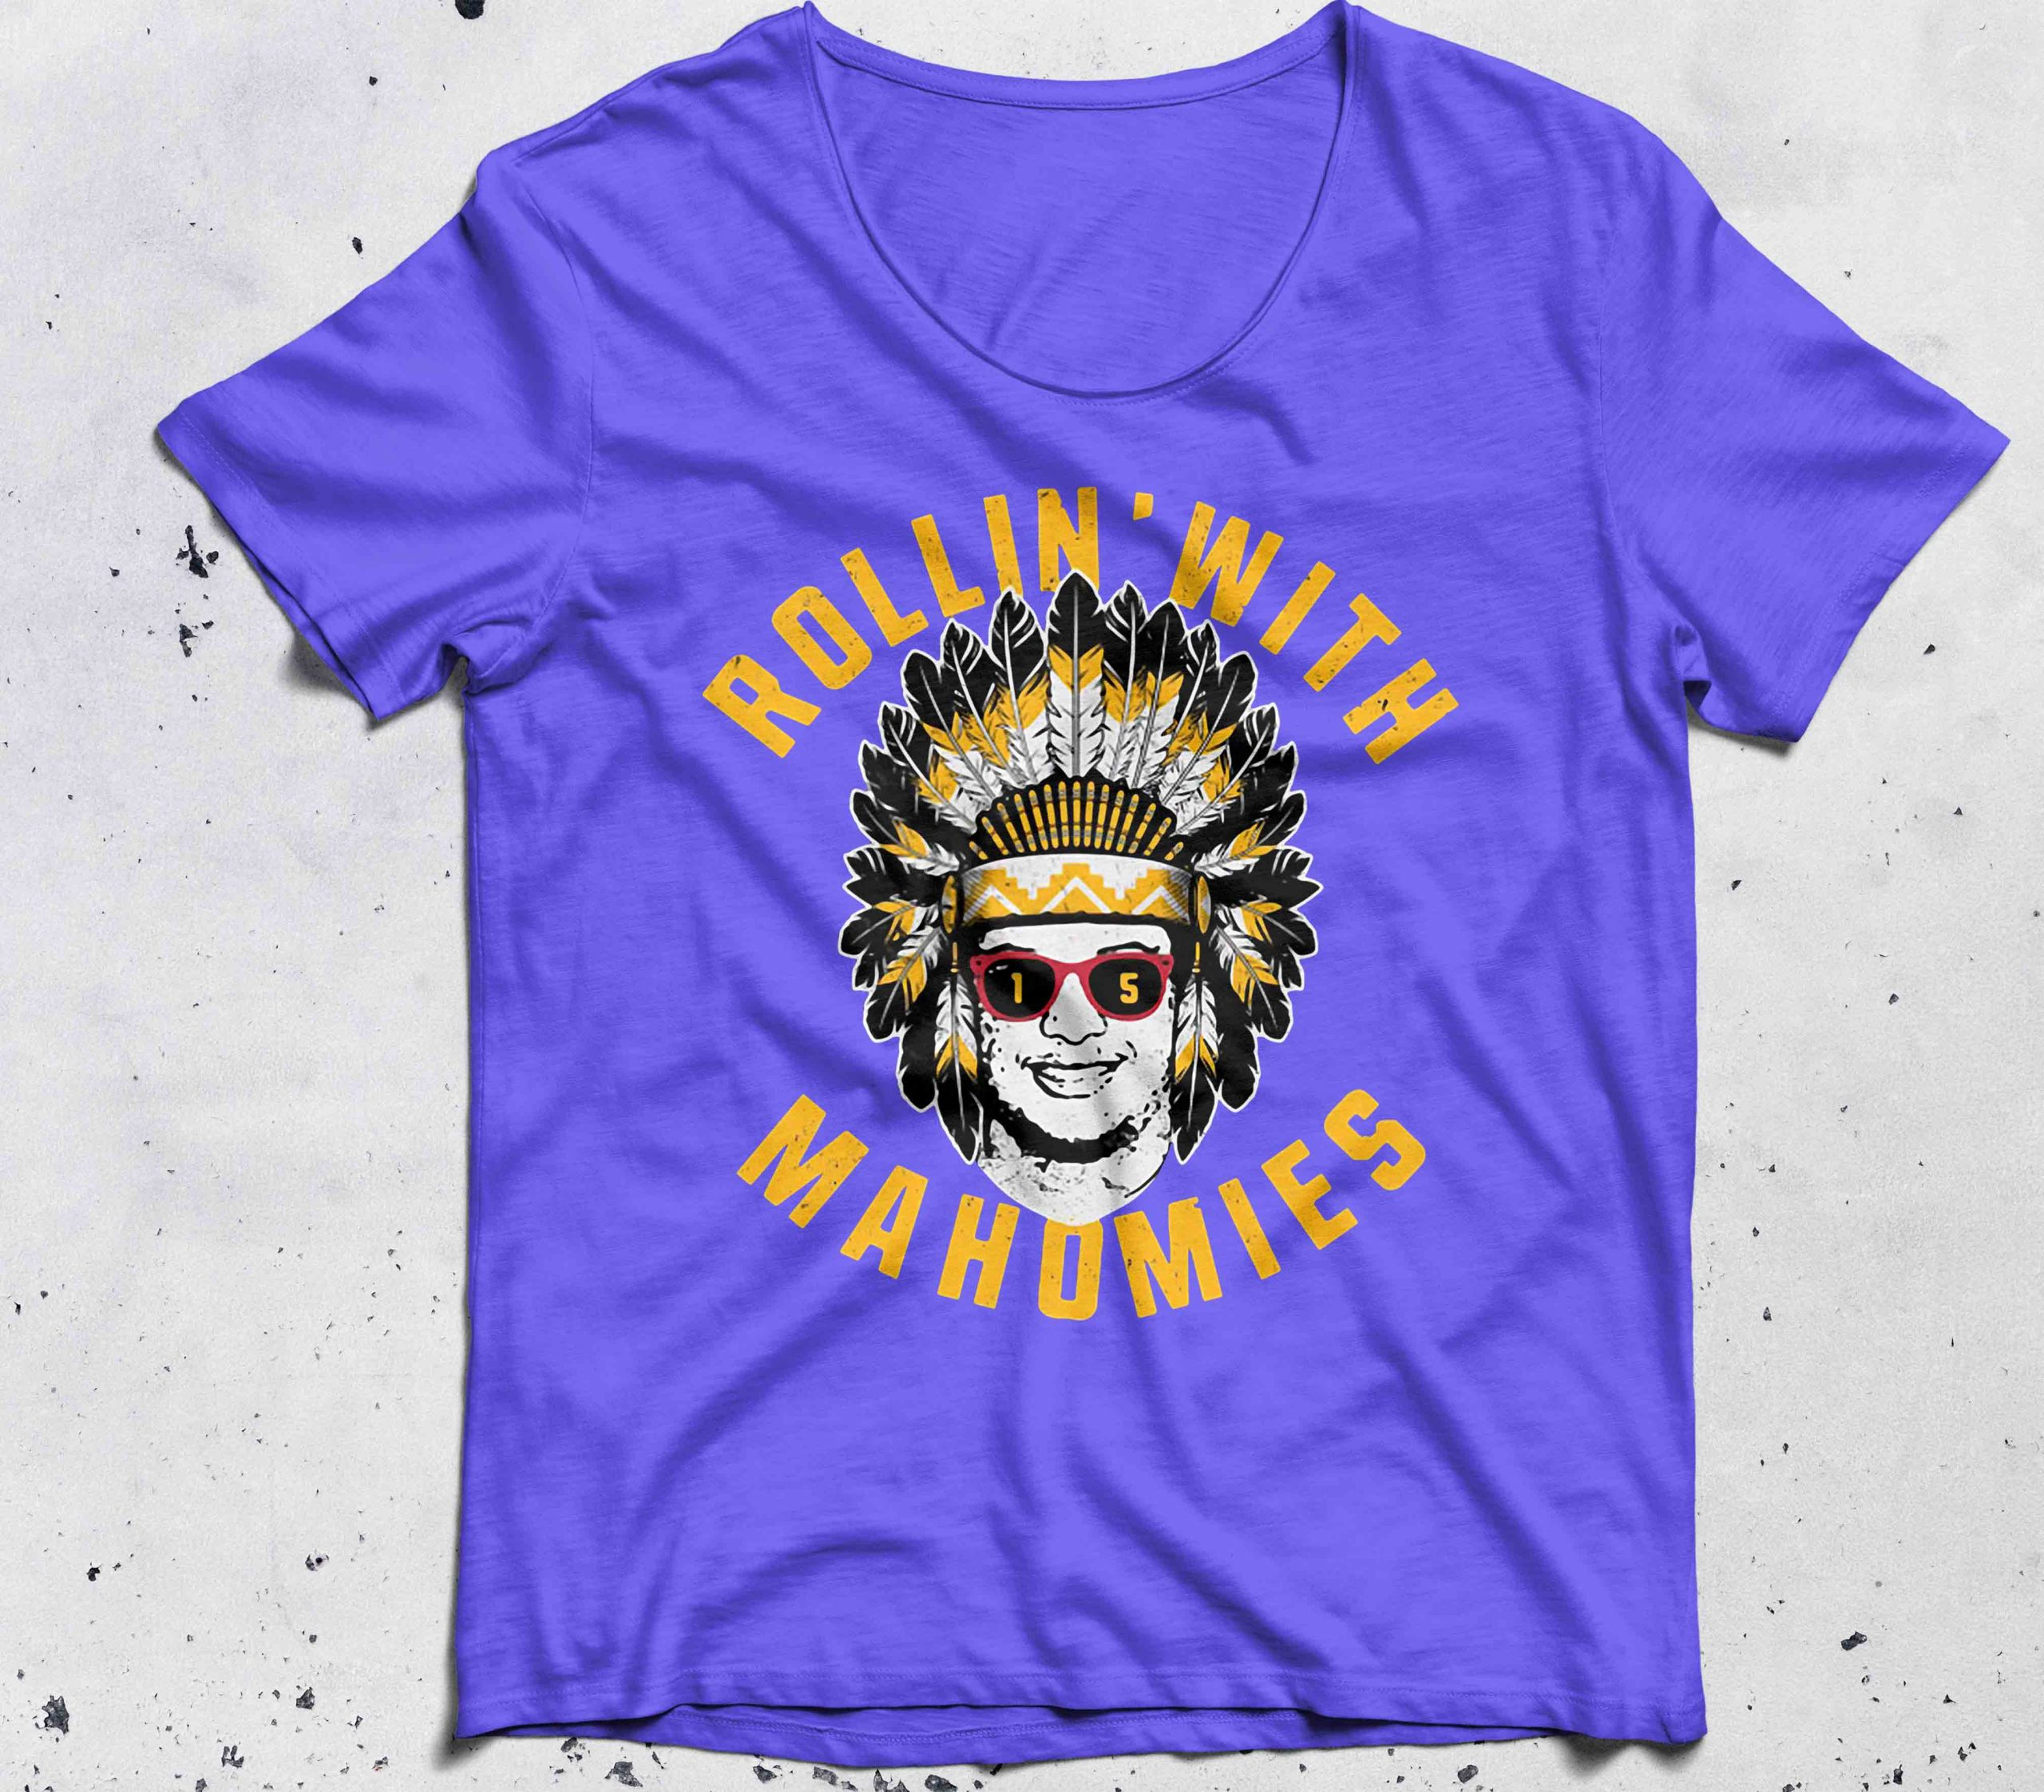 Rollin' with Mahomies Patrick Mahomes shirt